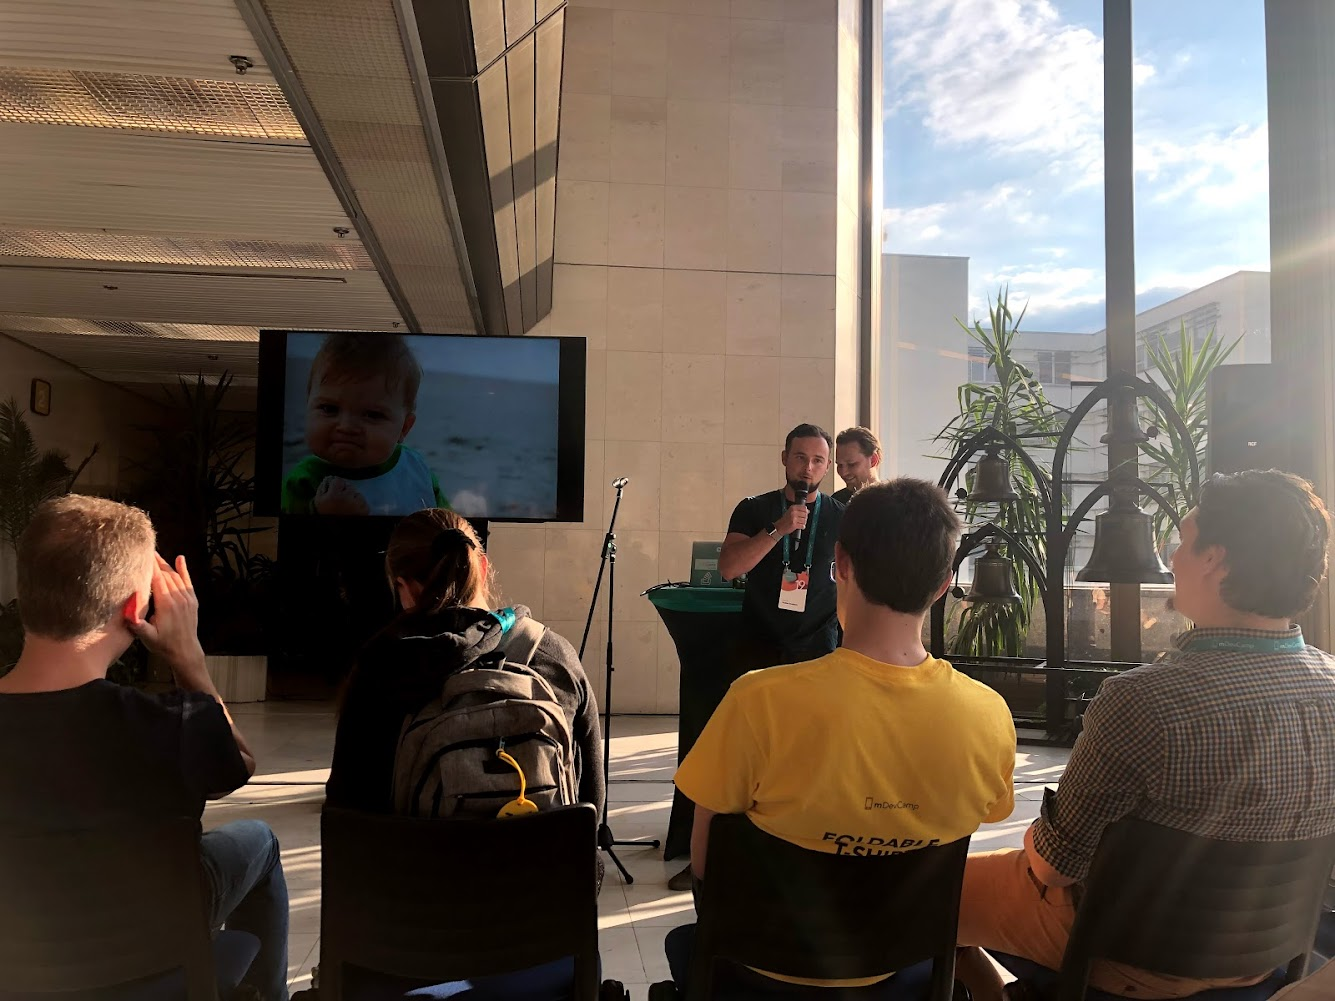 Primer speaker presentando su random slides